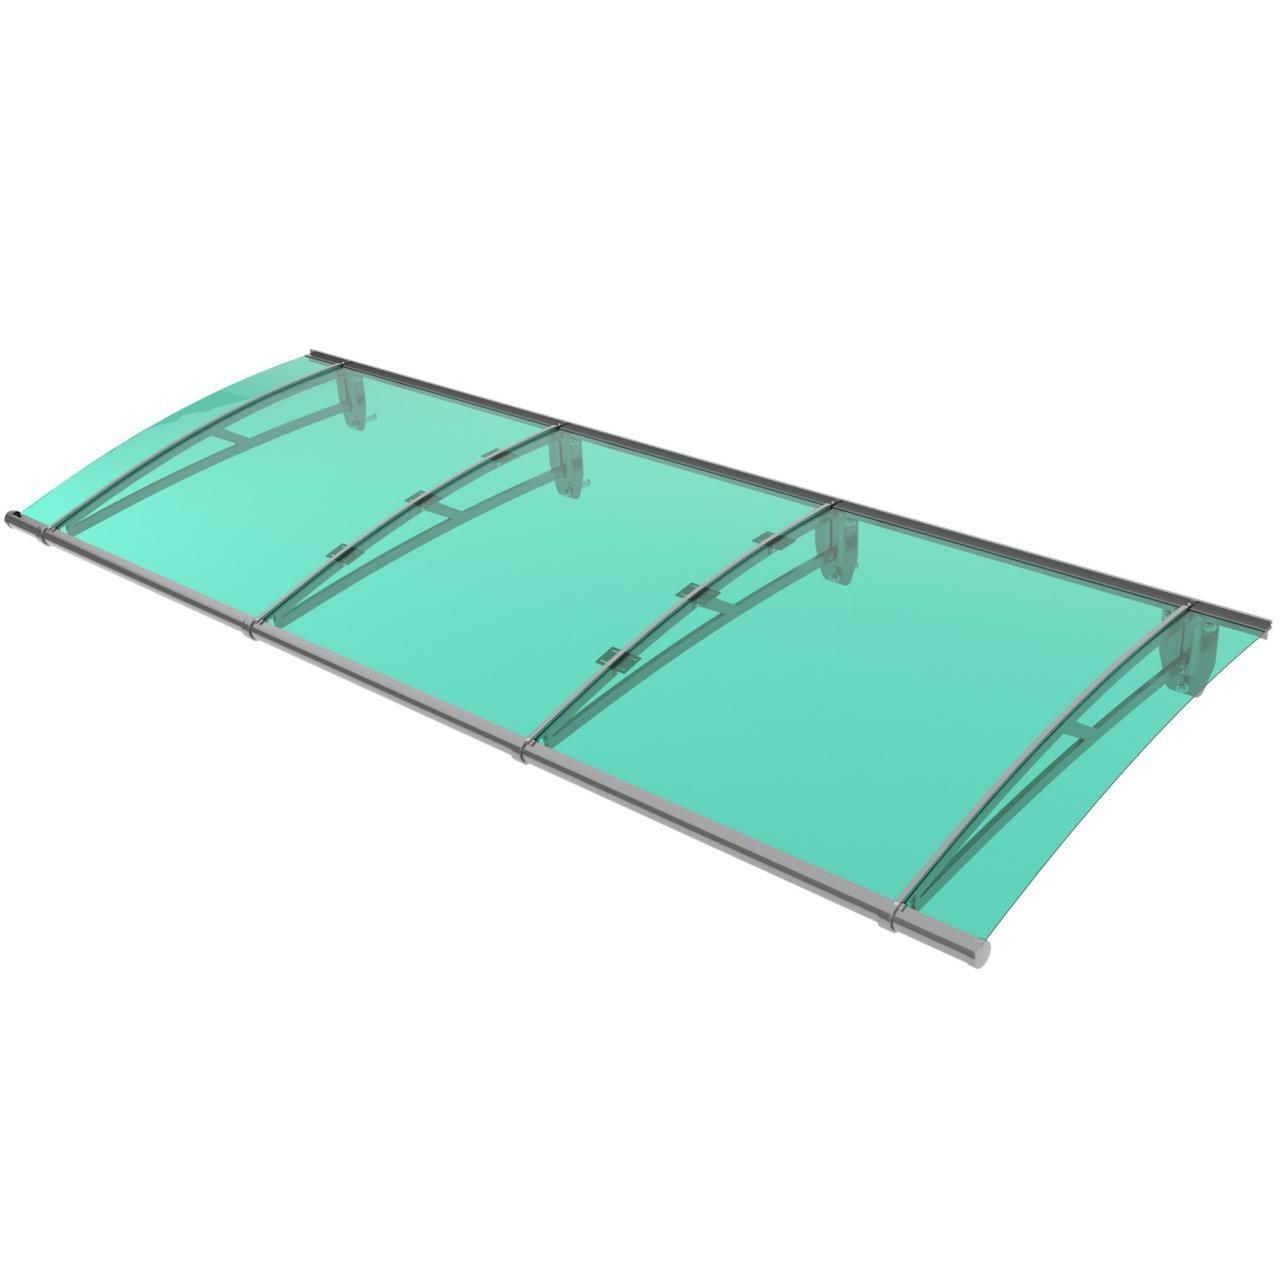 vordach alu haust rdach berdachung haust rvordach kunststoff pultvordach uv ebay. Black Bedroom Furniture Sets. Home Design Ideas